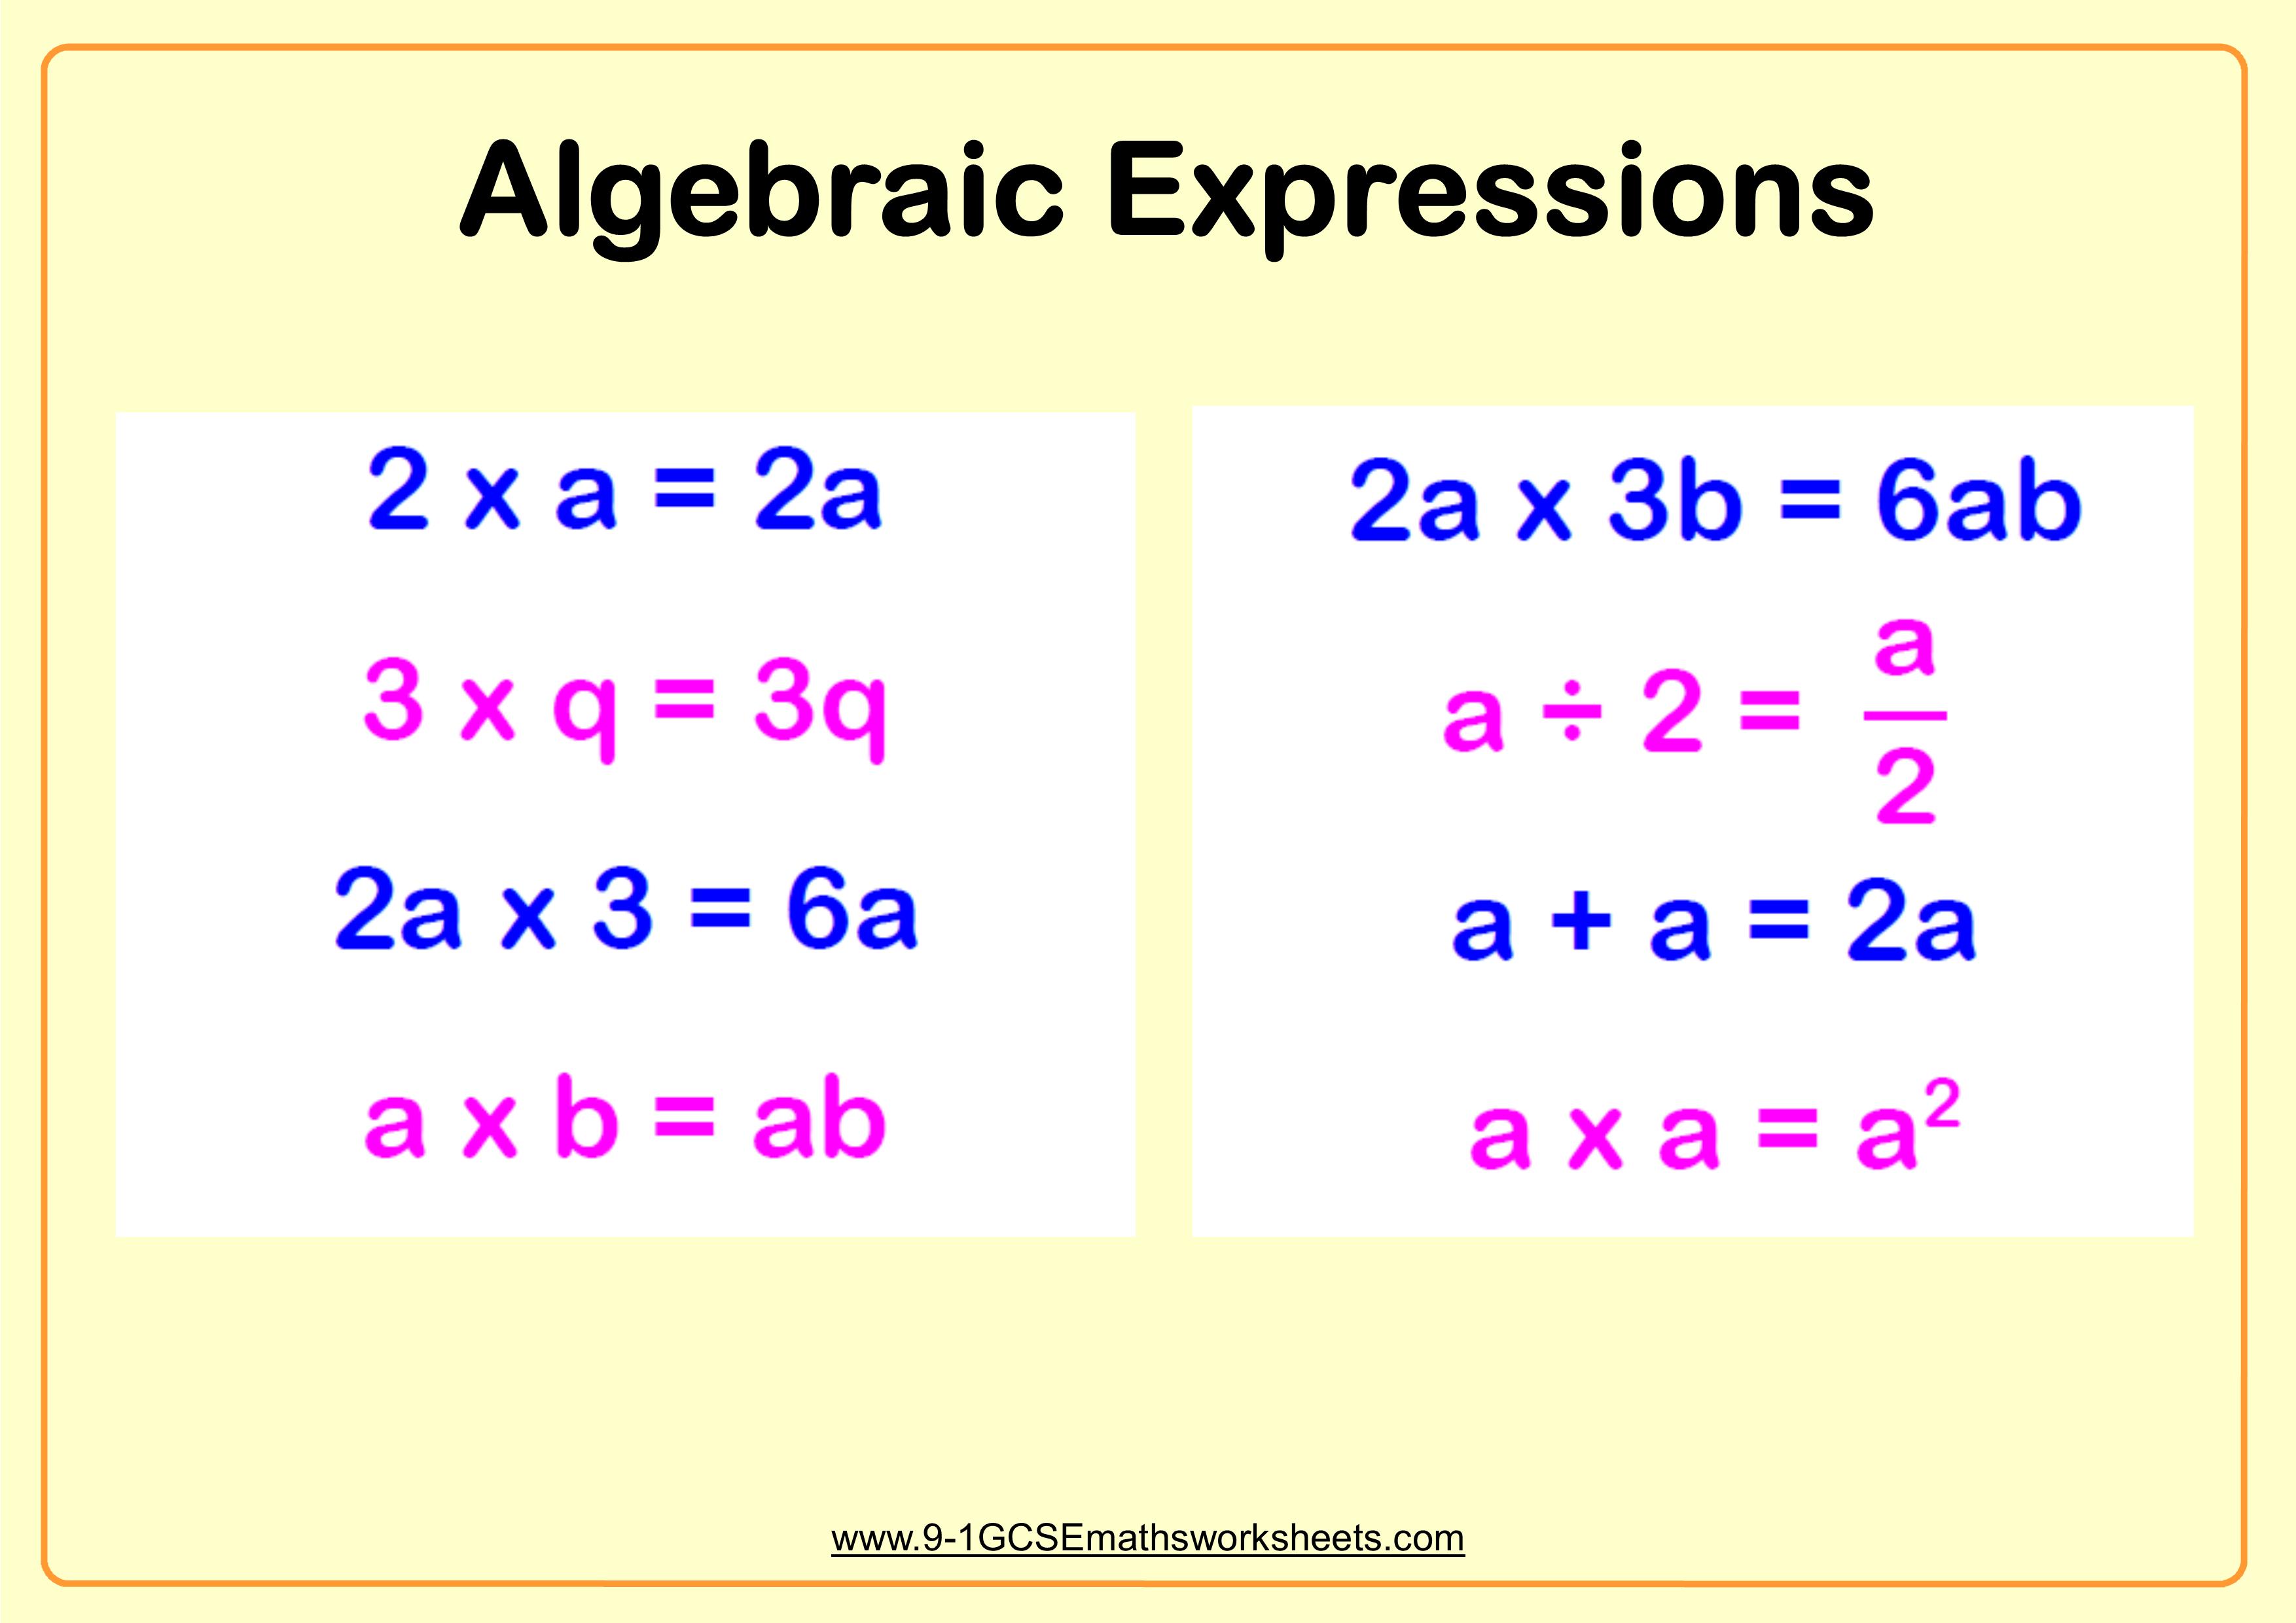 Algebraic Expressions Worksheet Example 1